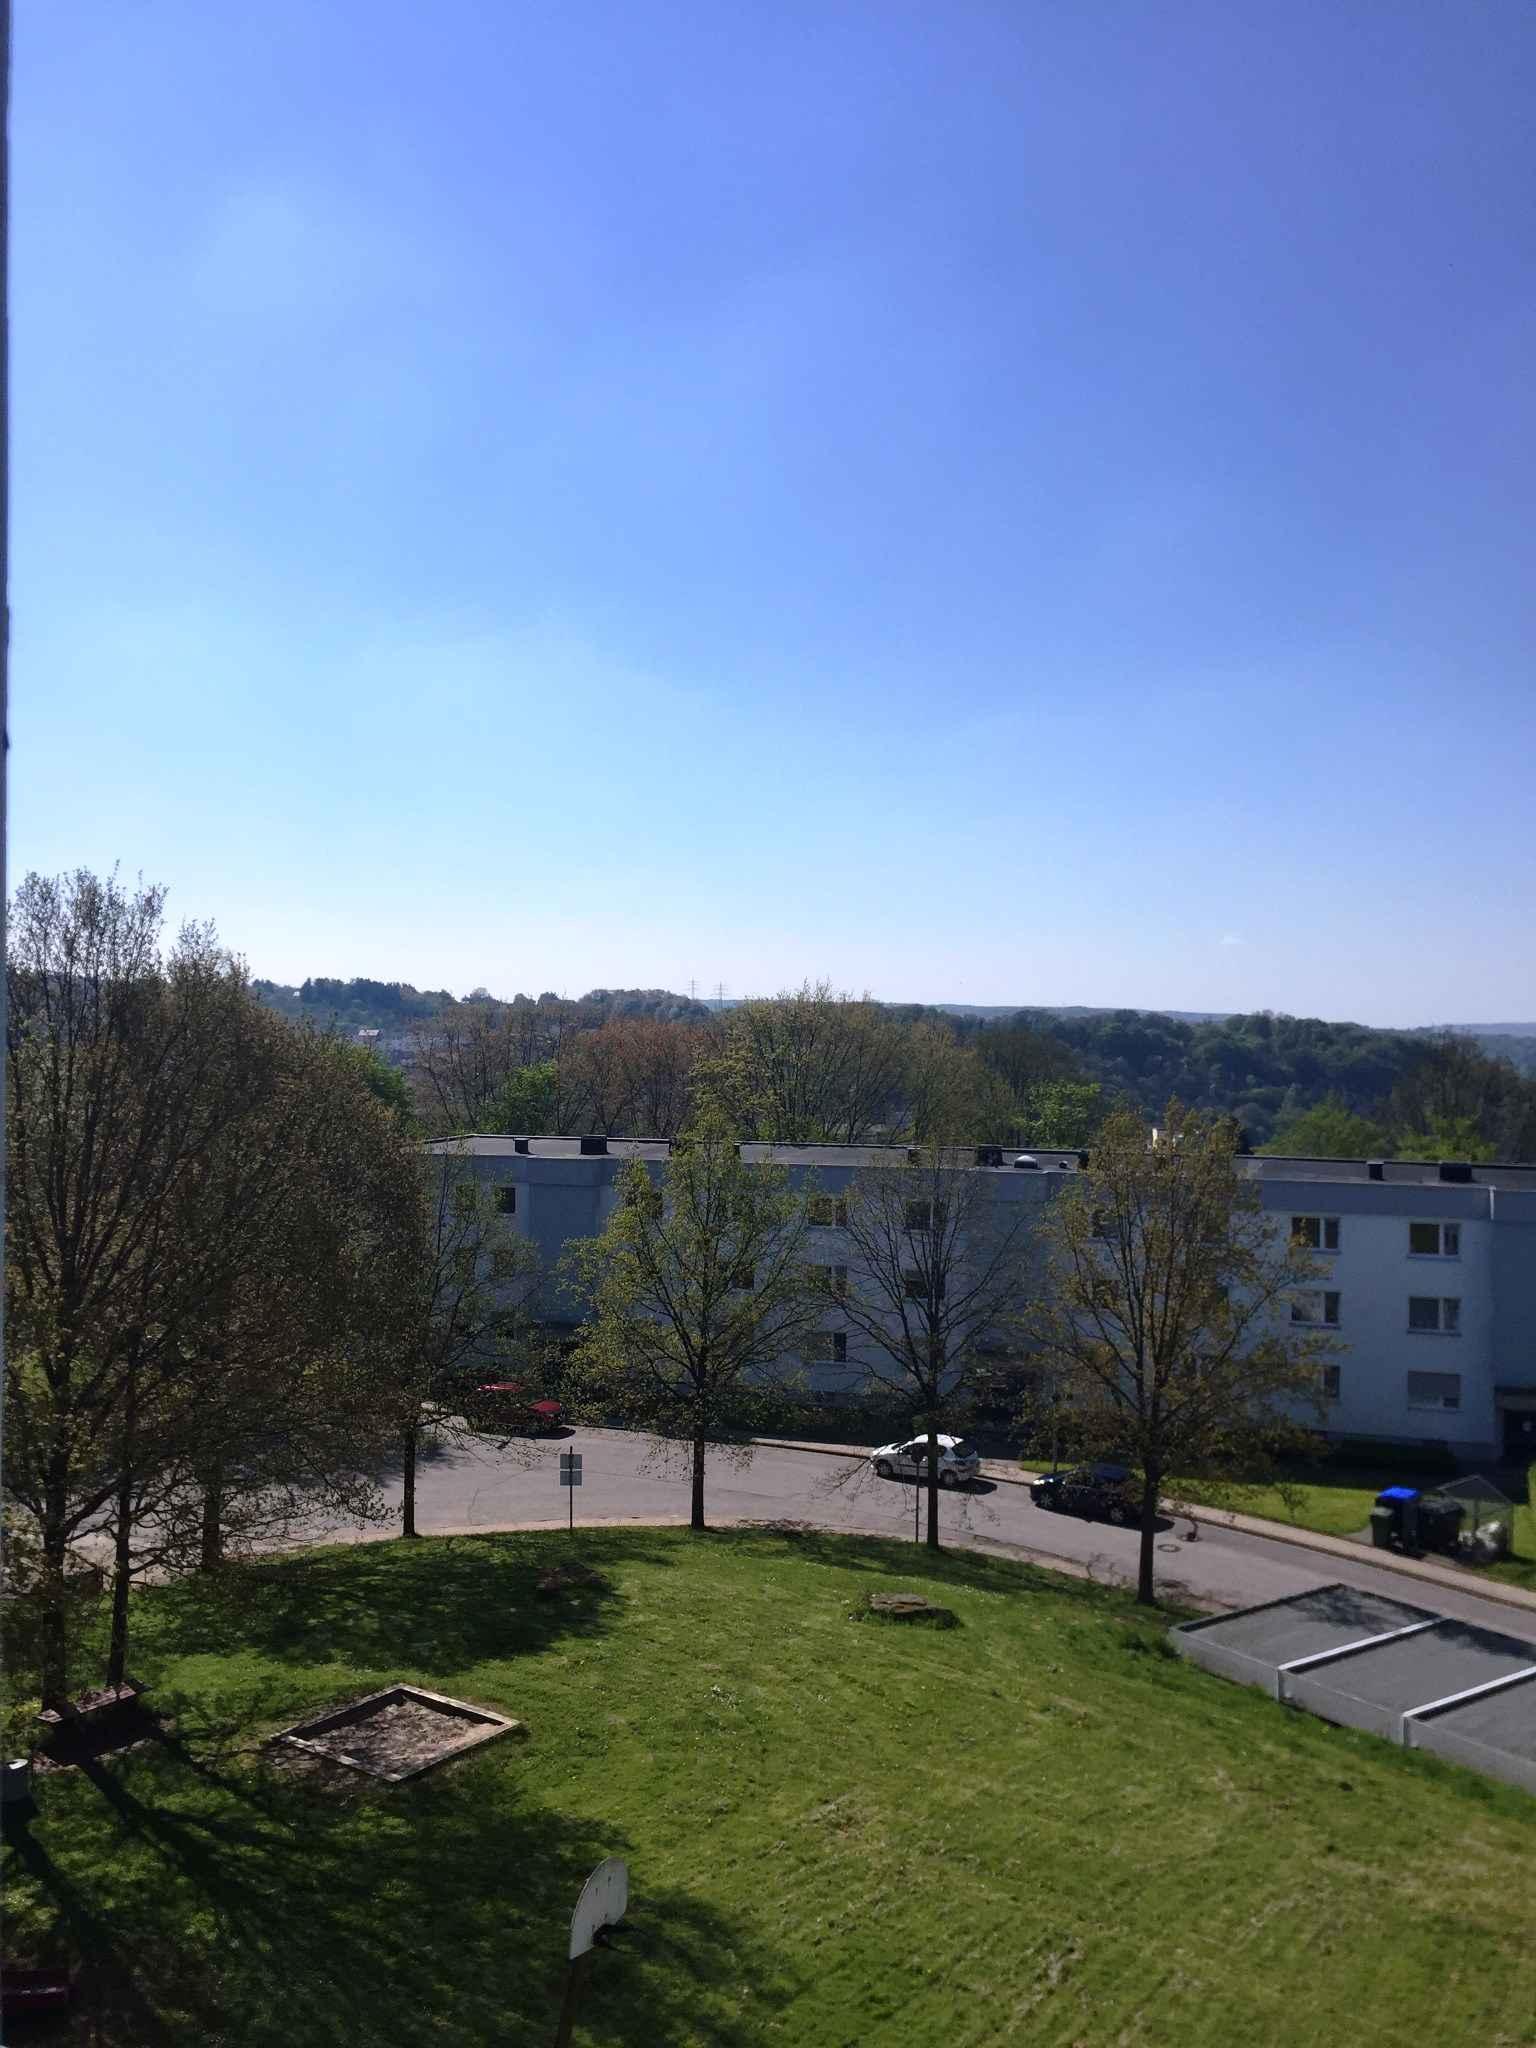 Holiday apartment mit Panoramafenster (1670817), Saarbrücken, Saarbrücken, Saarland, Germany, picture 5